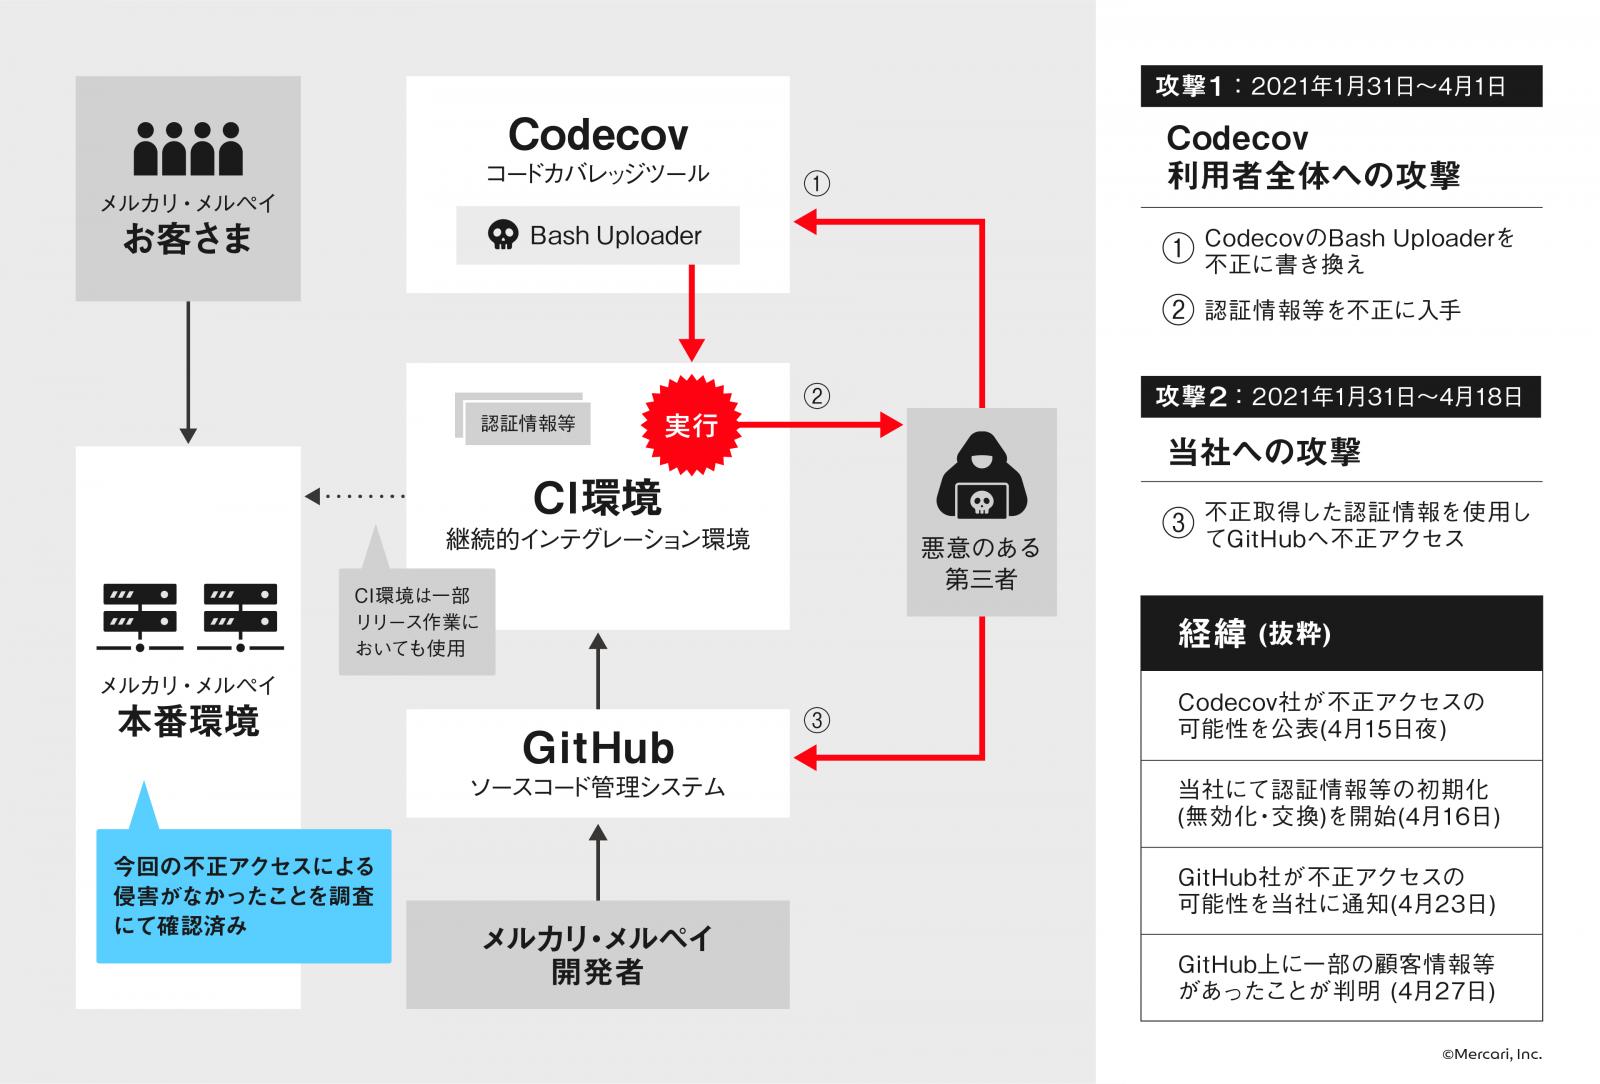 Mercari Codecov attack illustration